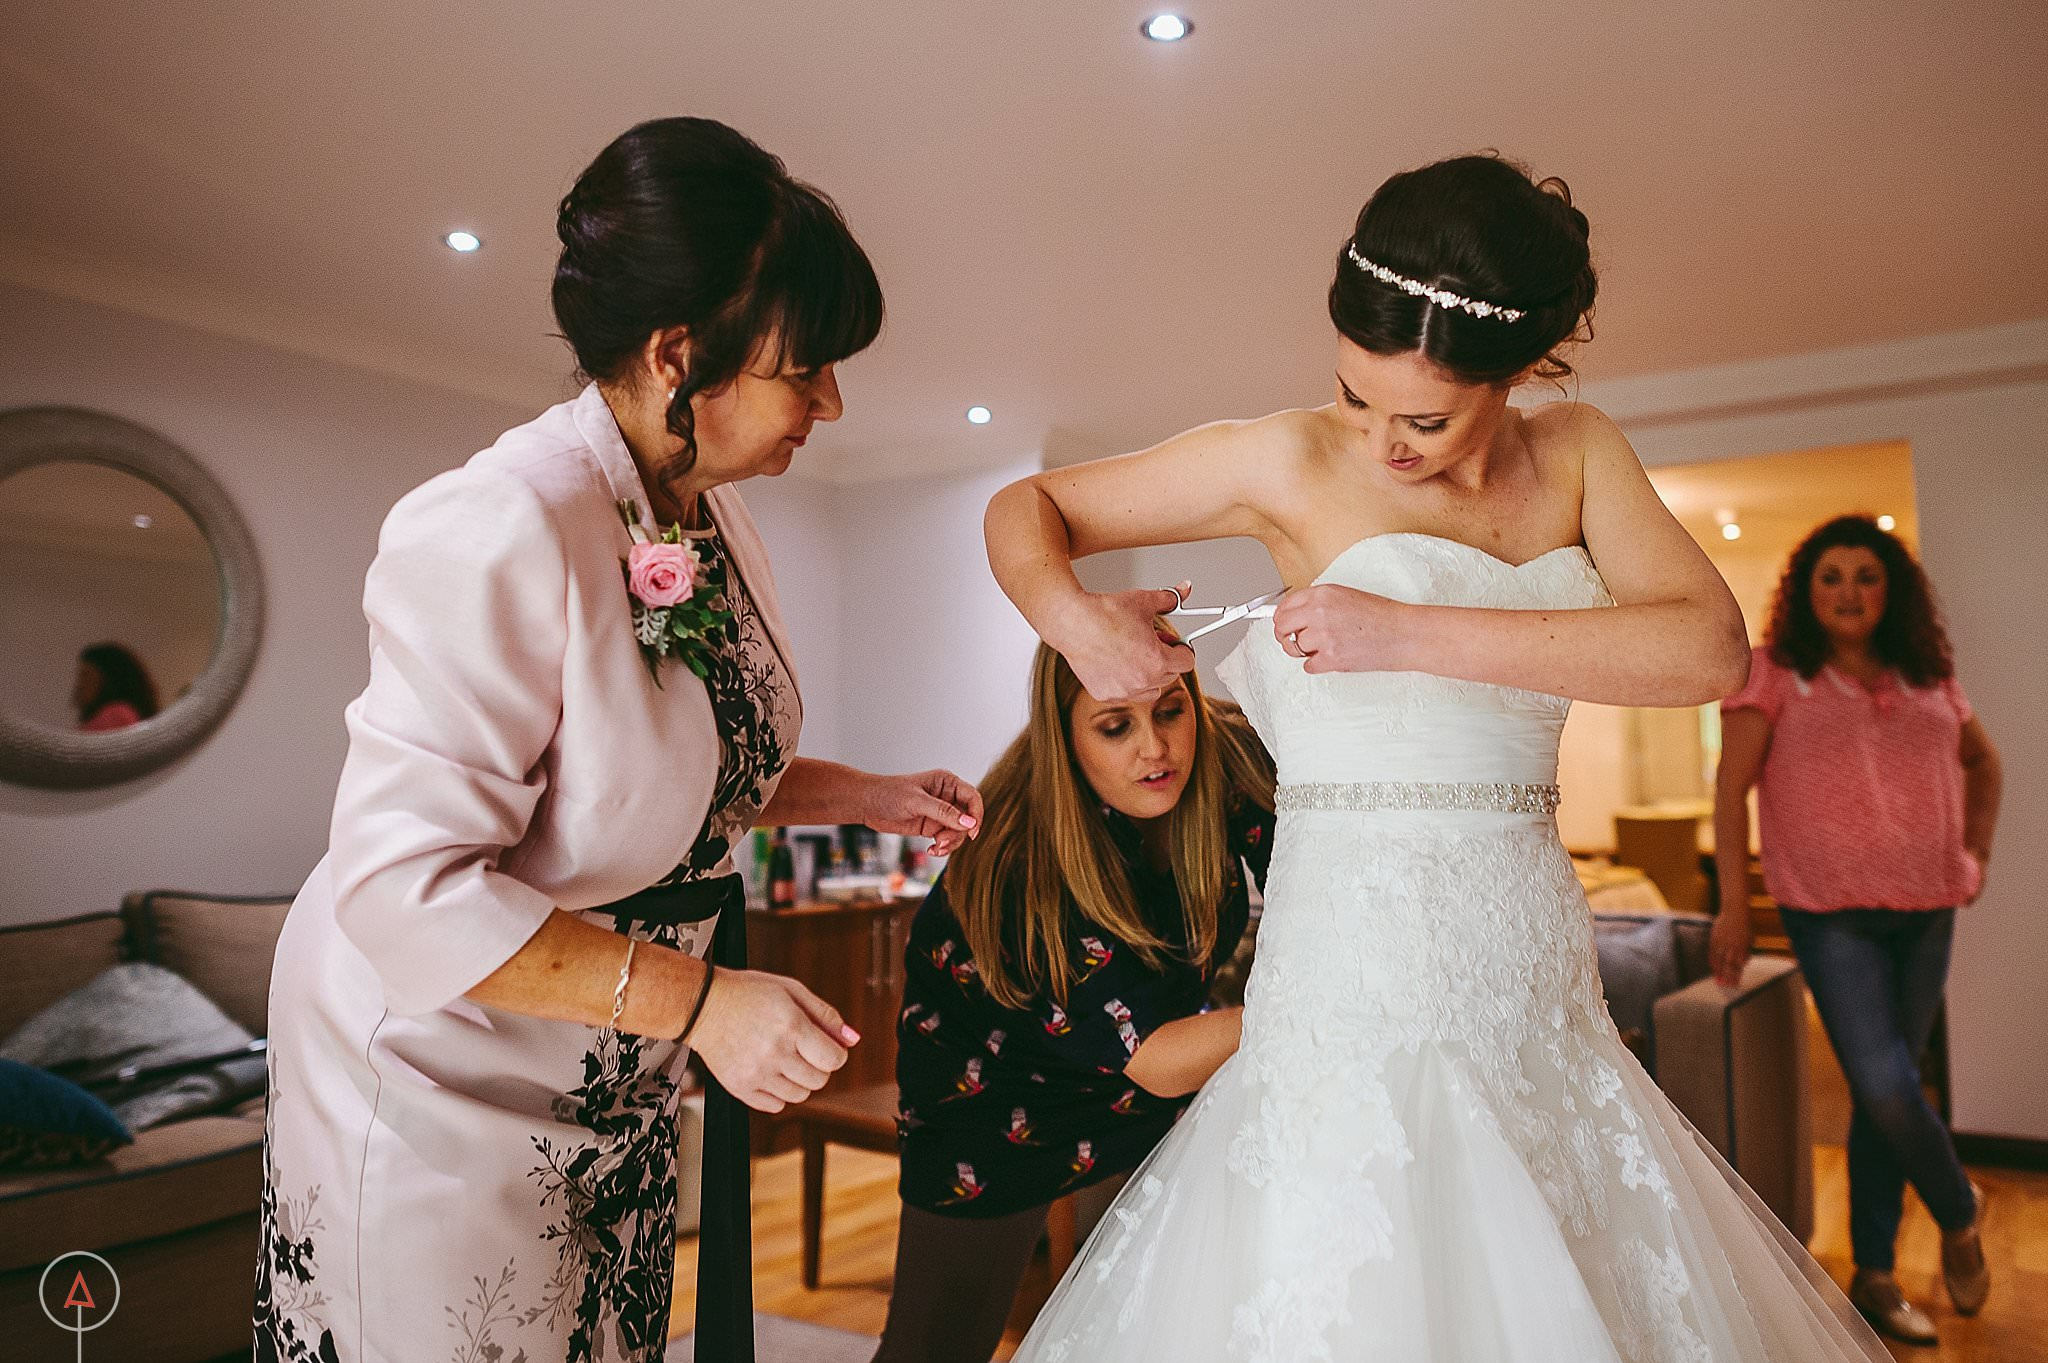 st-donats-llantwit-major-wedding-photography_0132